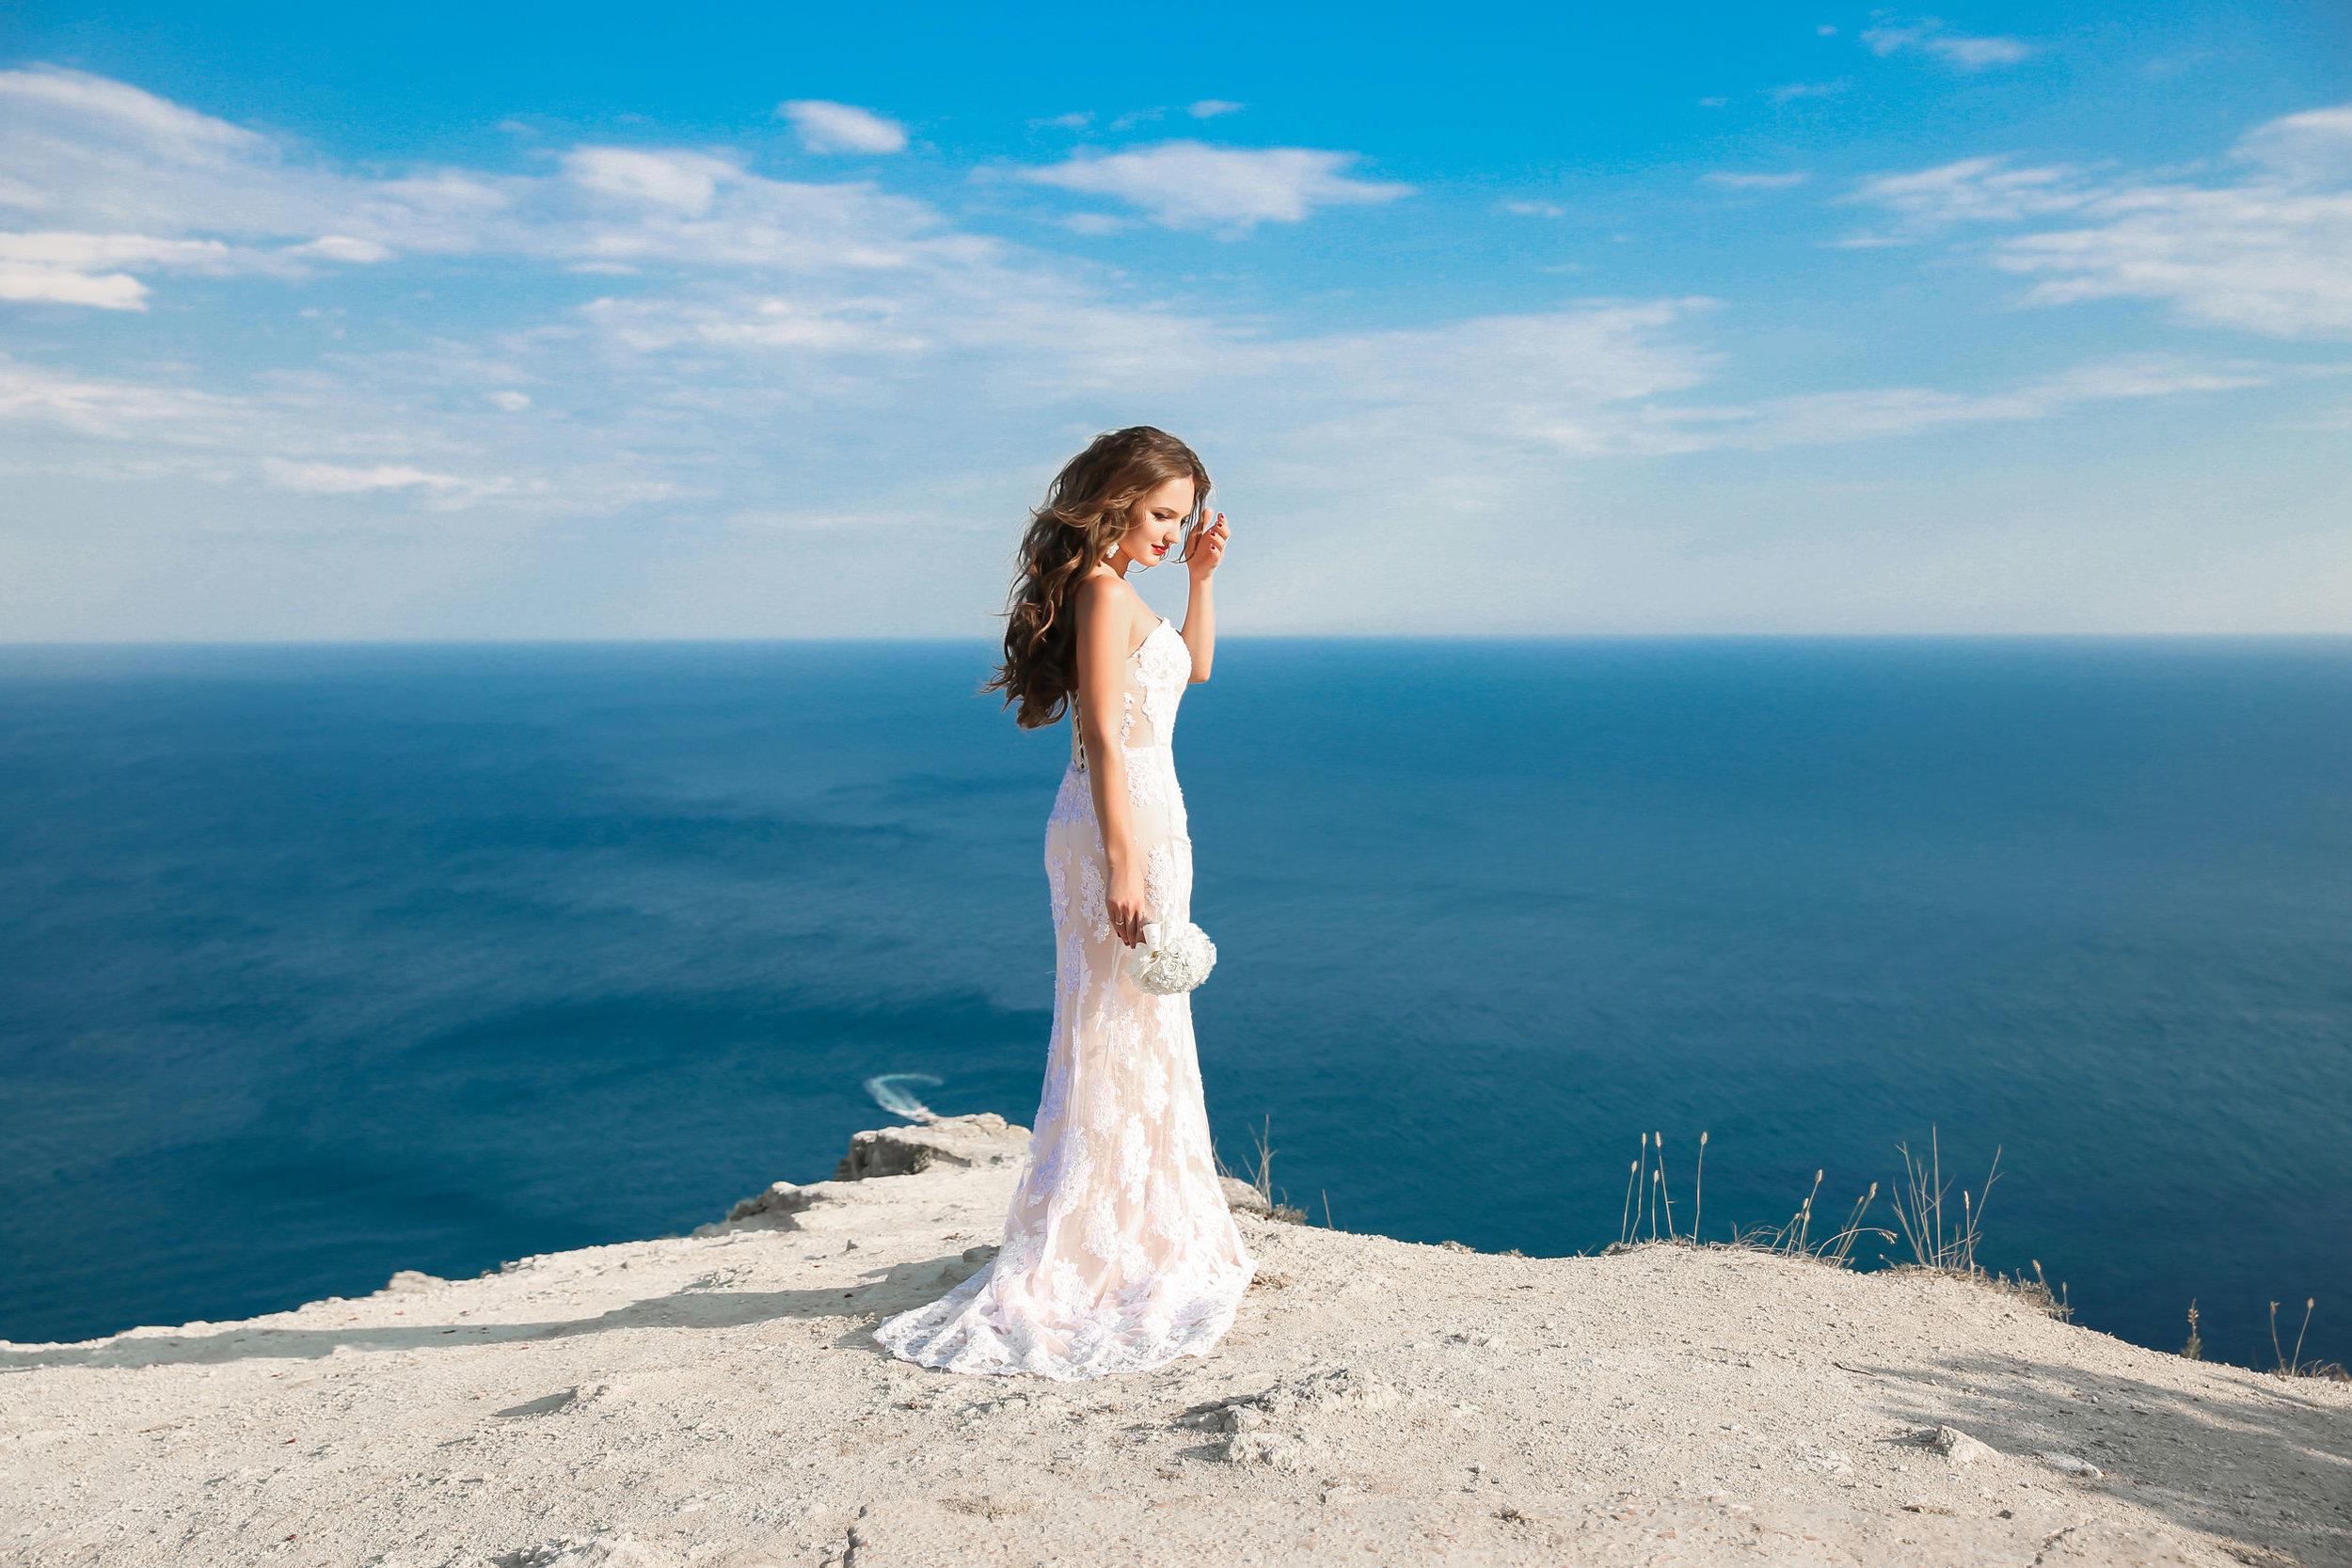 63777060 - beautiful bride in wedding dress outdoors photo. landscape background.